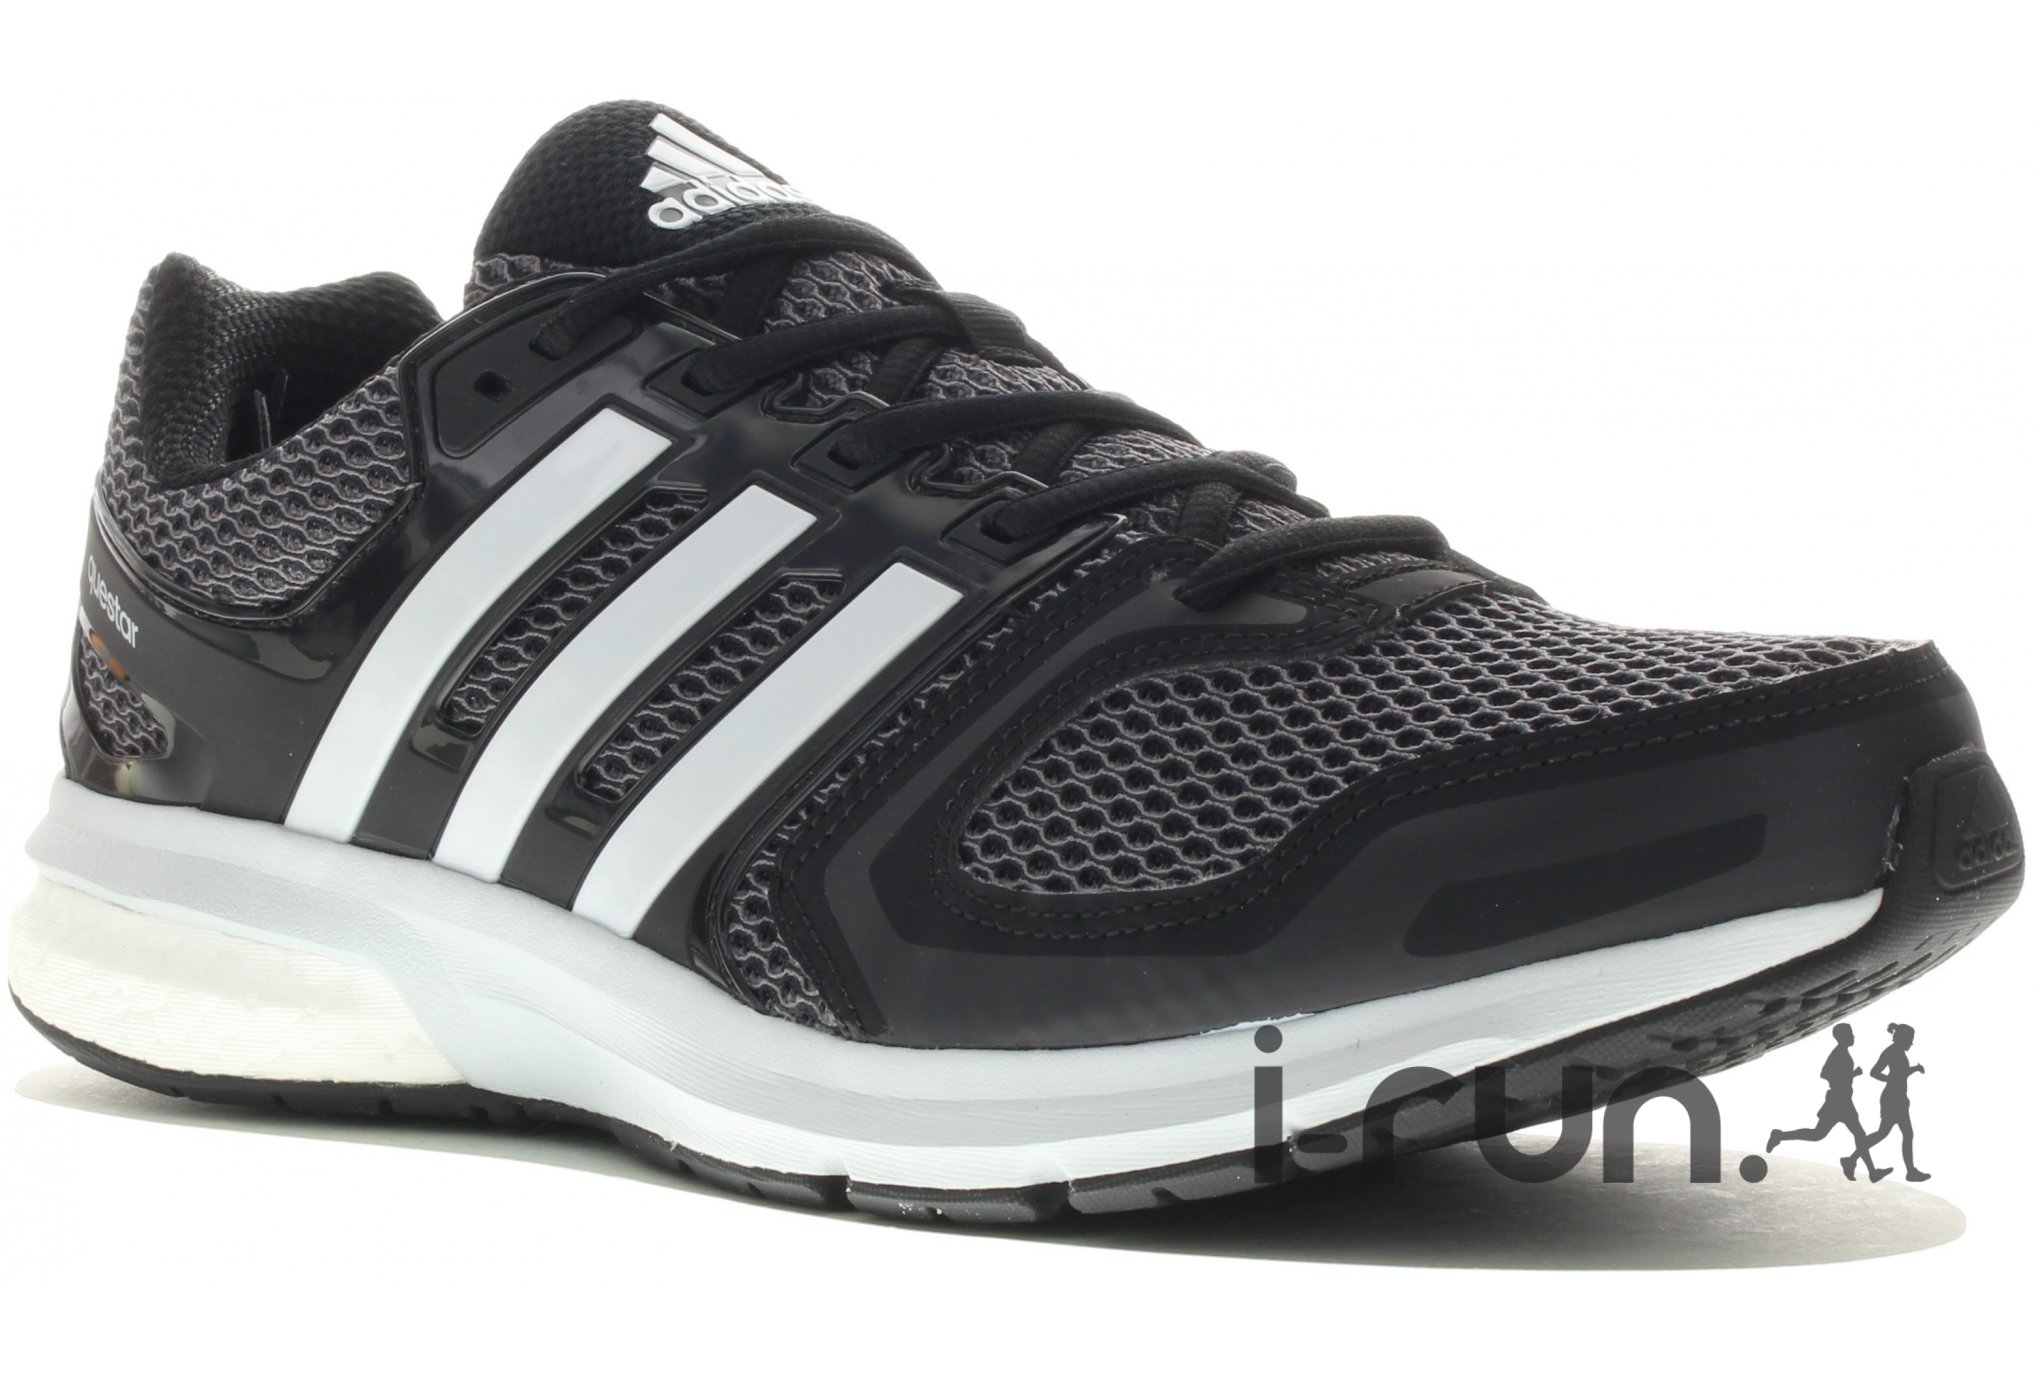 adidas Questar Boost M Chaussures homme